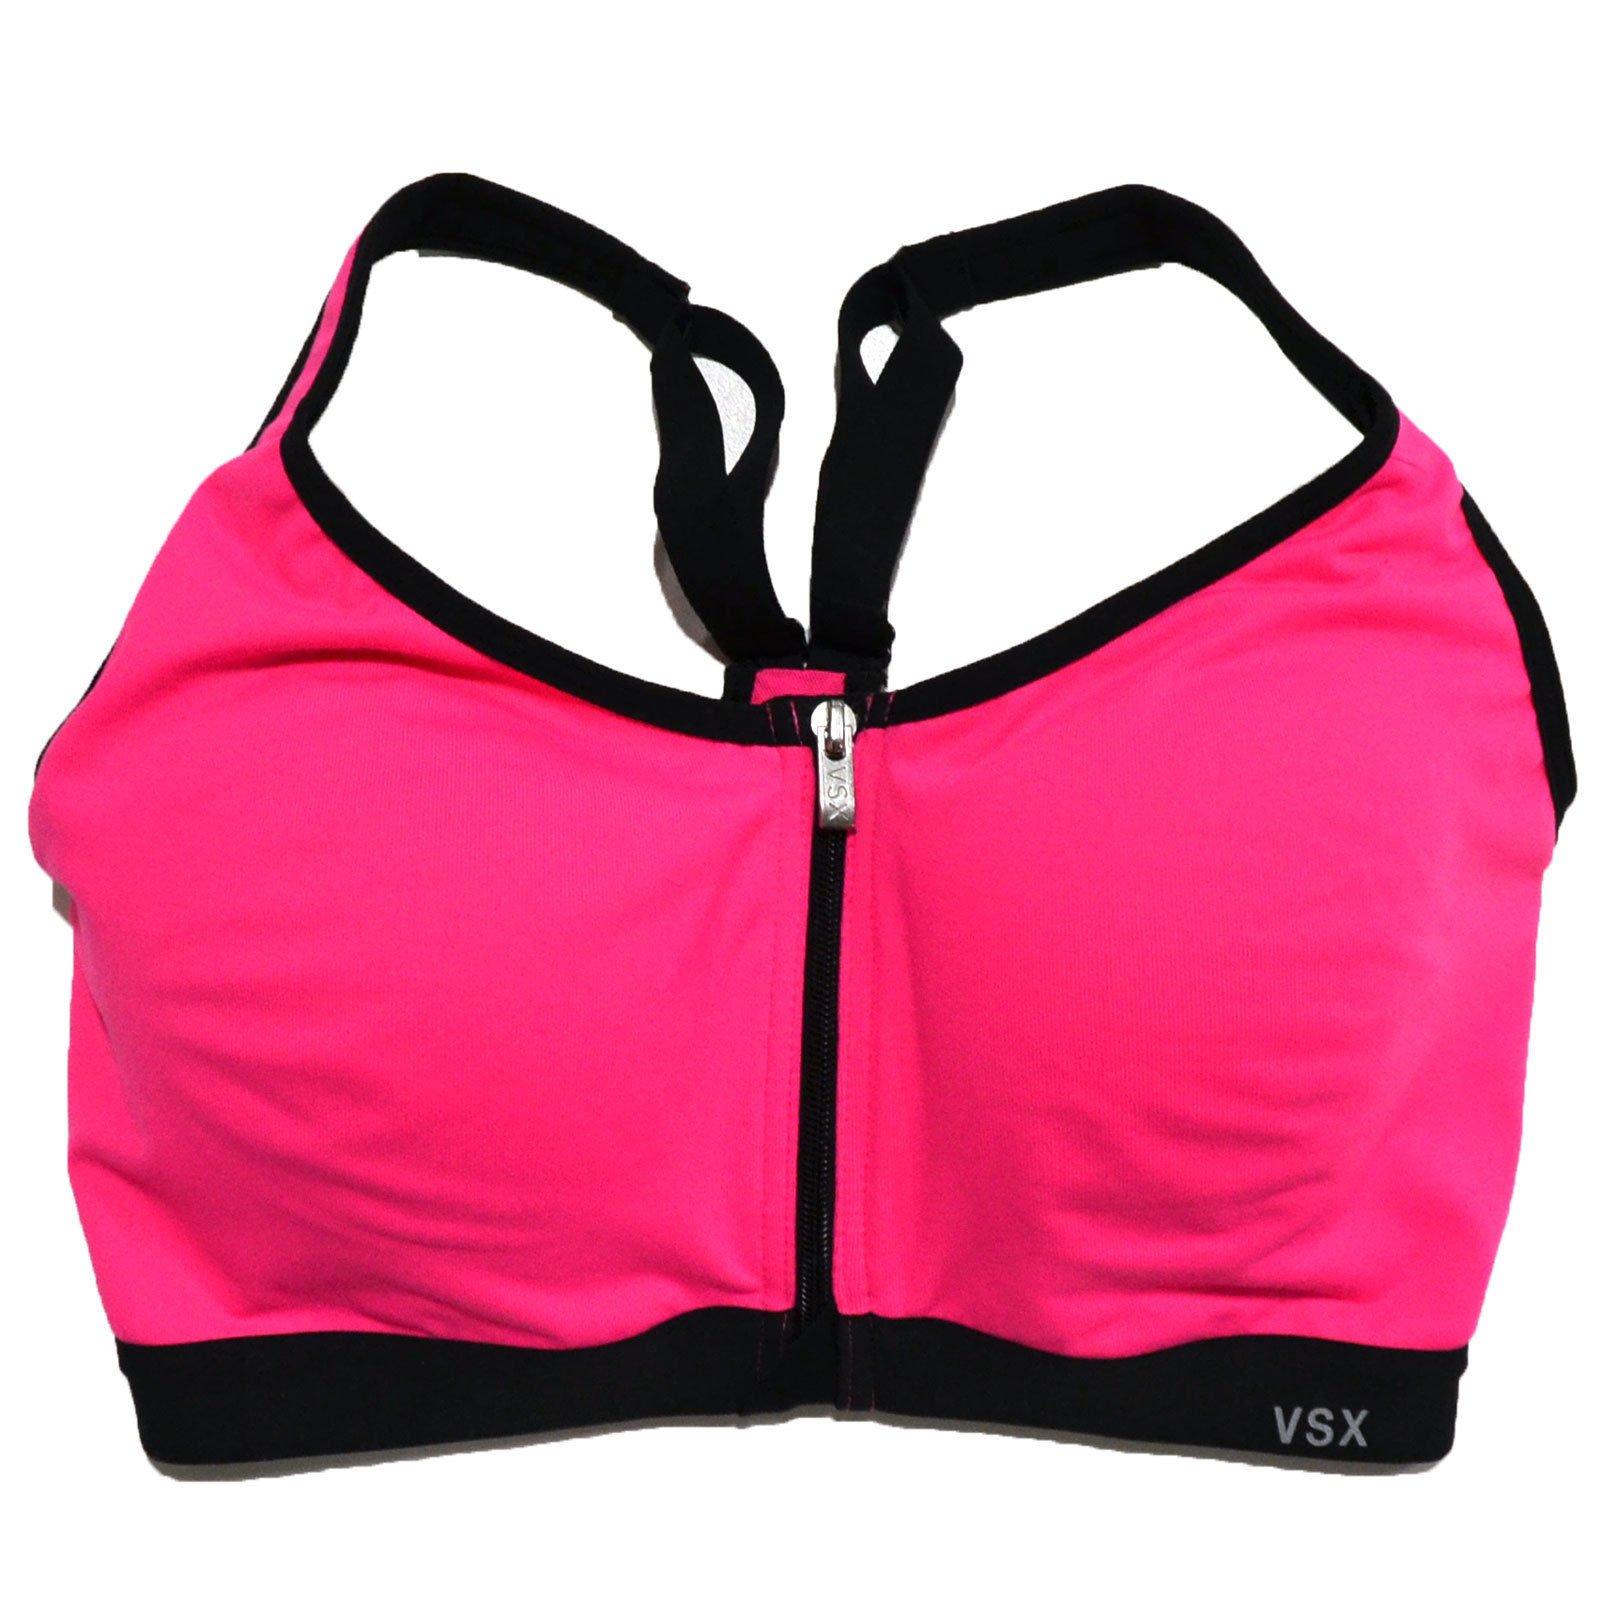 Victoria's Secret VSX Sports Bra Front Close Knockout (Hot Pink, 32C)